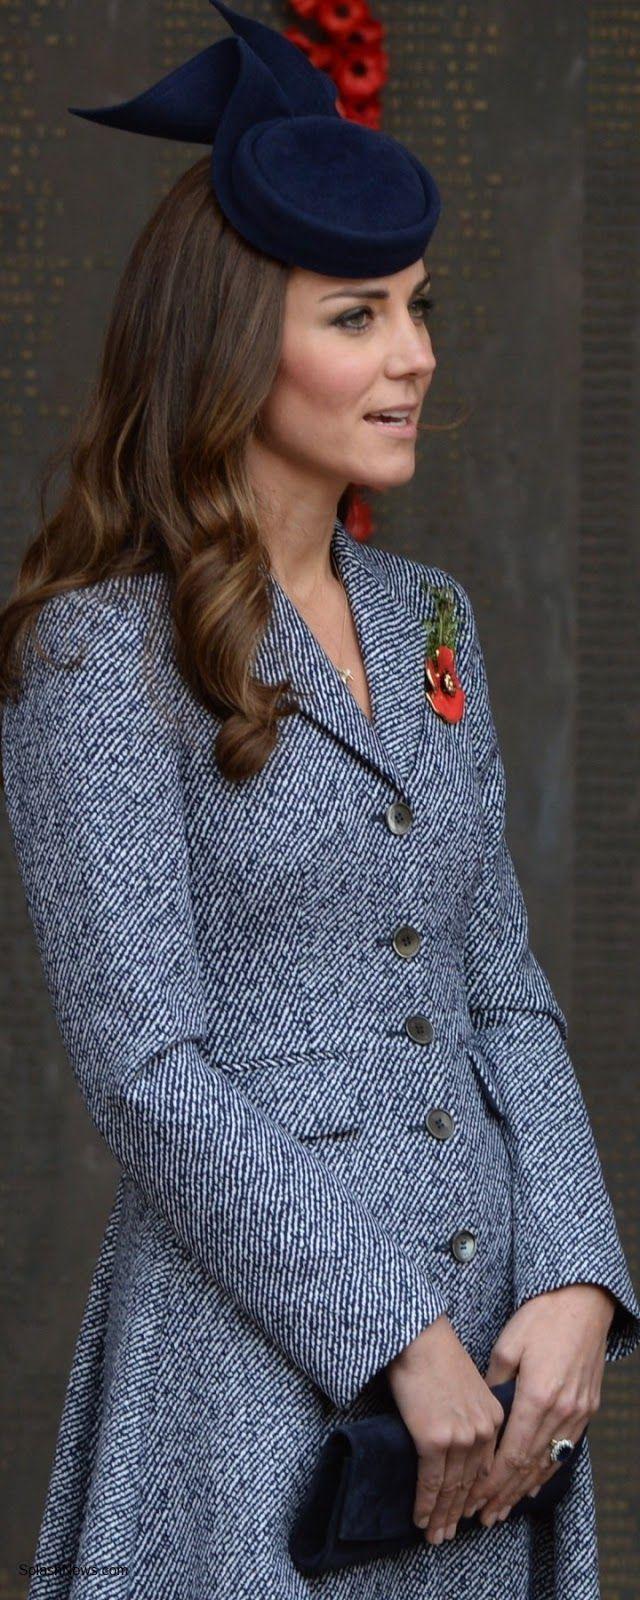 duchesskate: duchesskate: Cambridge Royal Tour-Day 16, Canberra, Australia, April 25, 2014-The Duchess of Cambridge on Anzac Day.